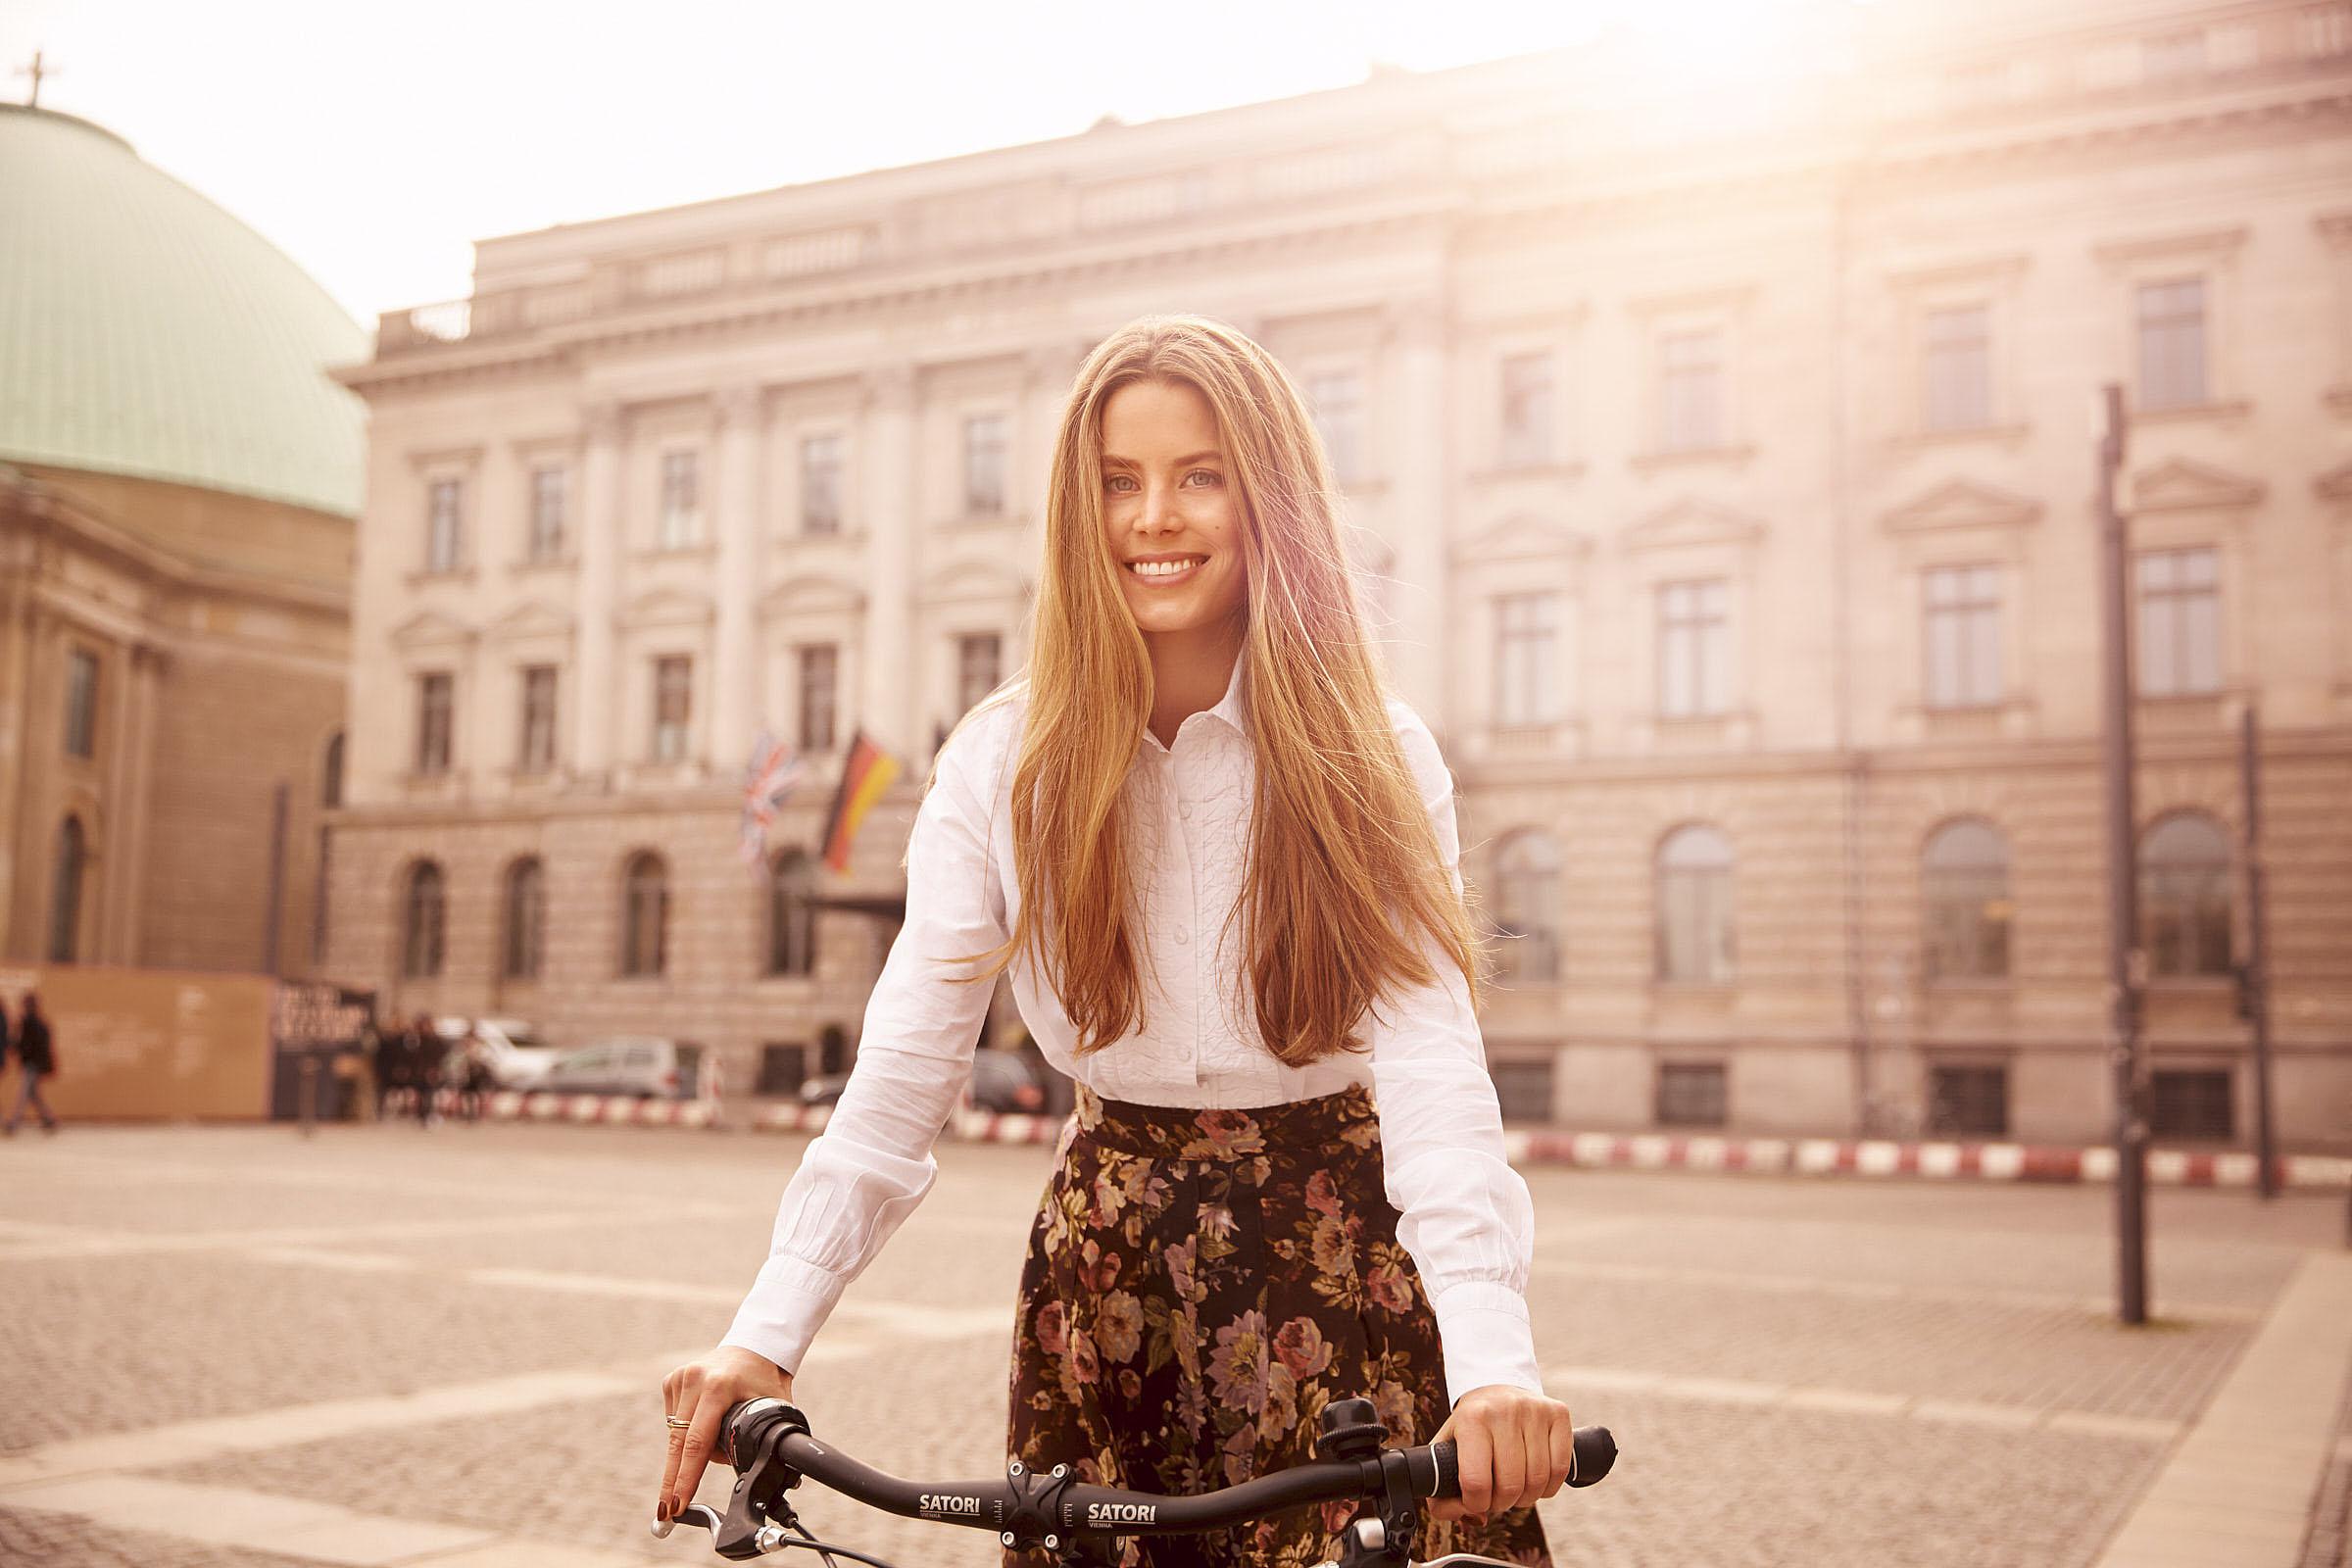 Irene Forte mit dem Fahrrad auf dem Bebelplatz vor dem Hotel de Rome Berlin am 10.03.2015